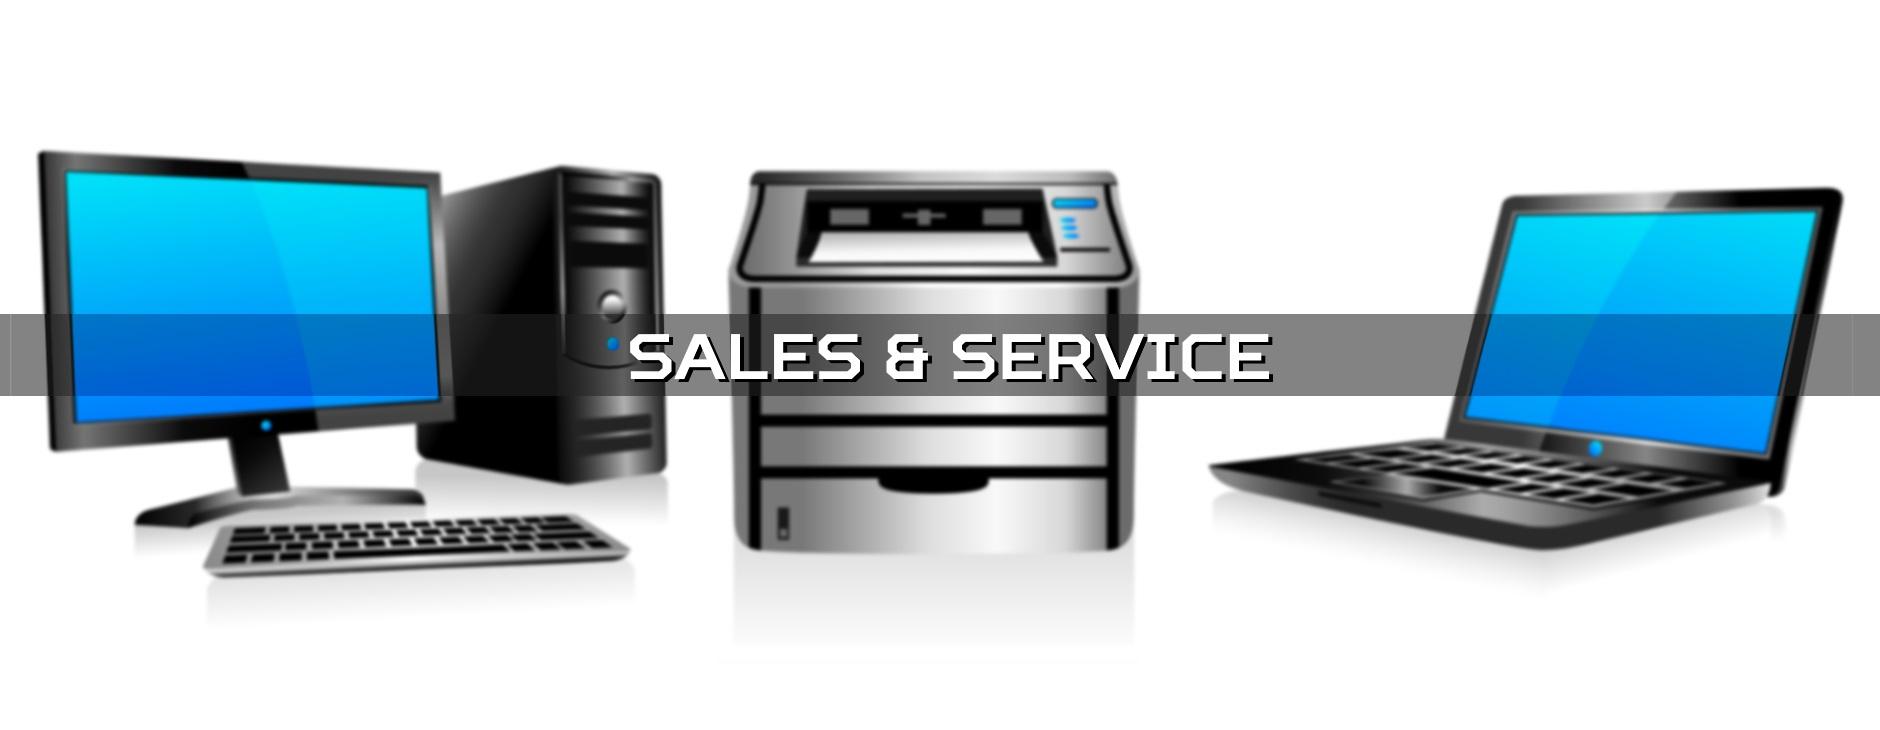 Sales-Service-1.jpg